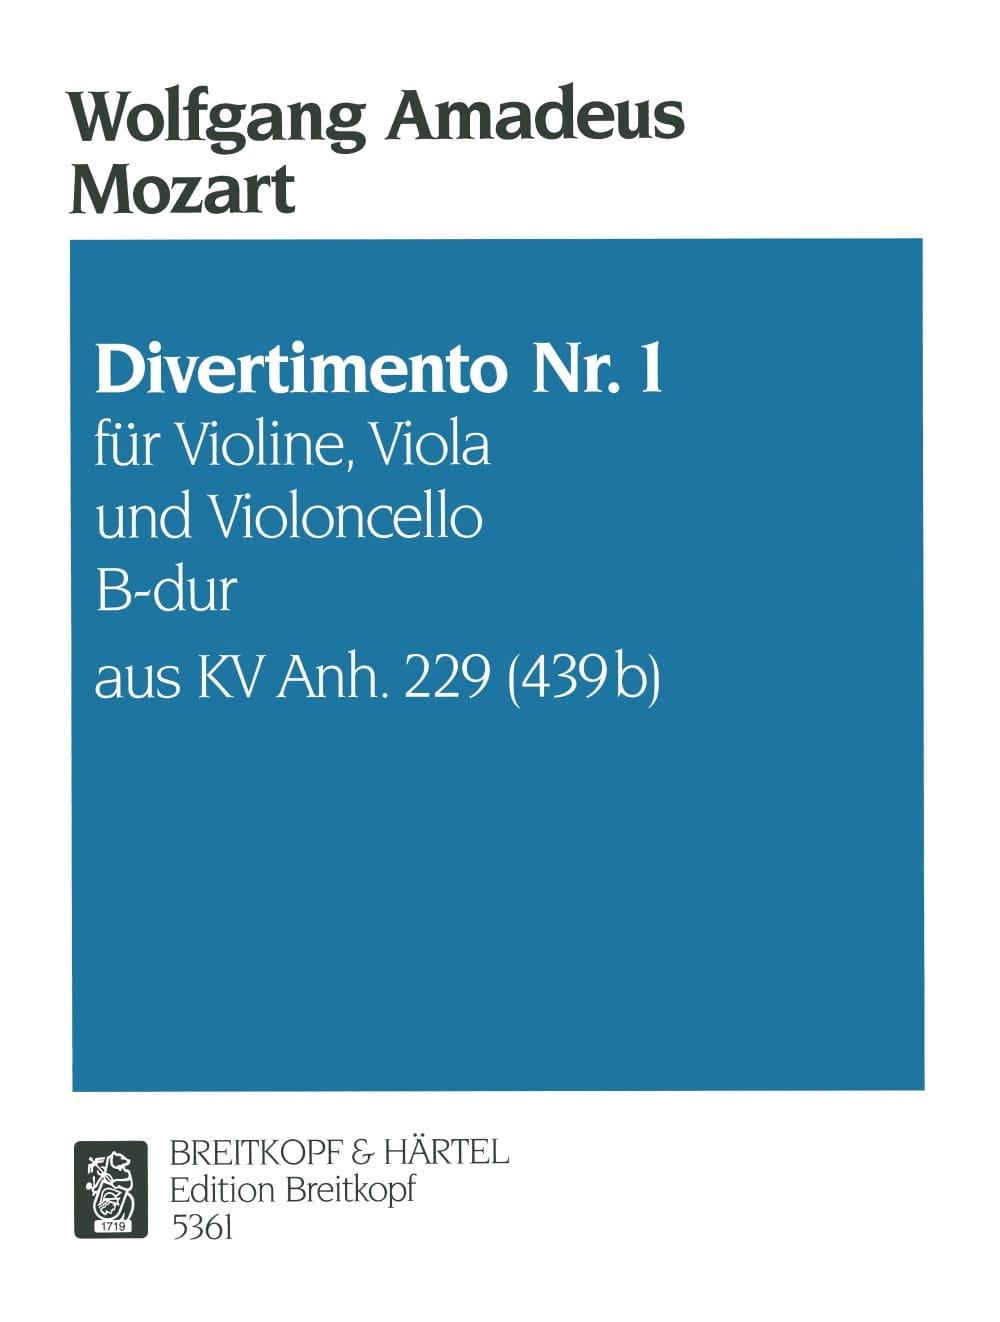 Divertimento Nr.1 B-Dur KV Anh. 229 -Violine Viola Cello - Stimmen - laflutedepan.com